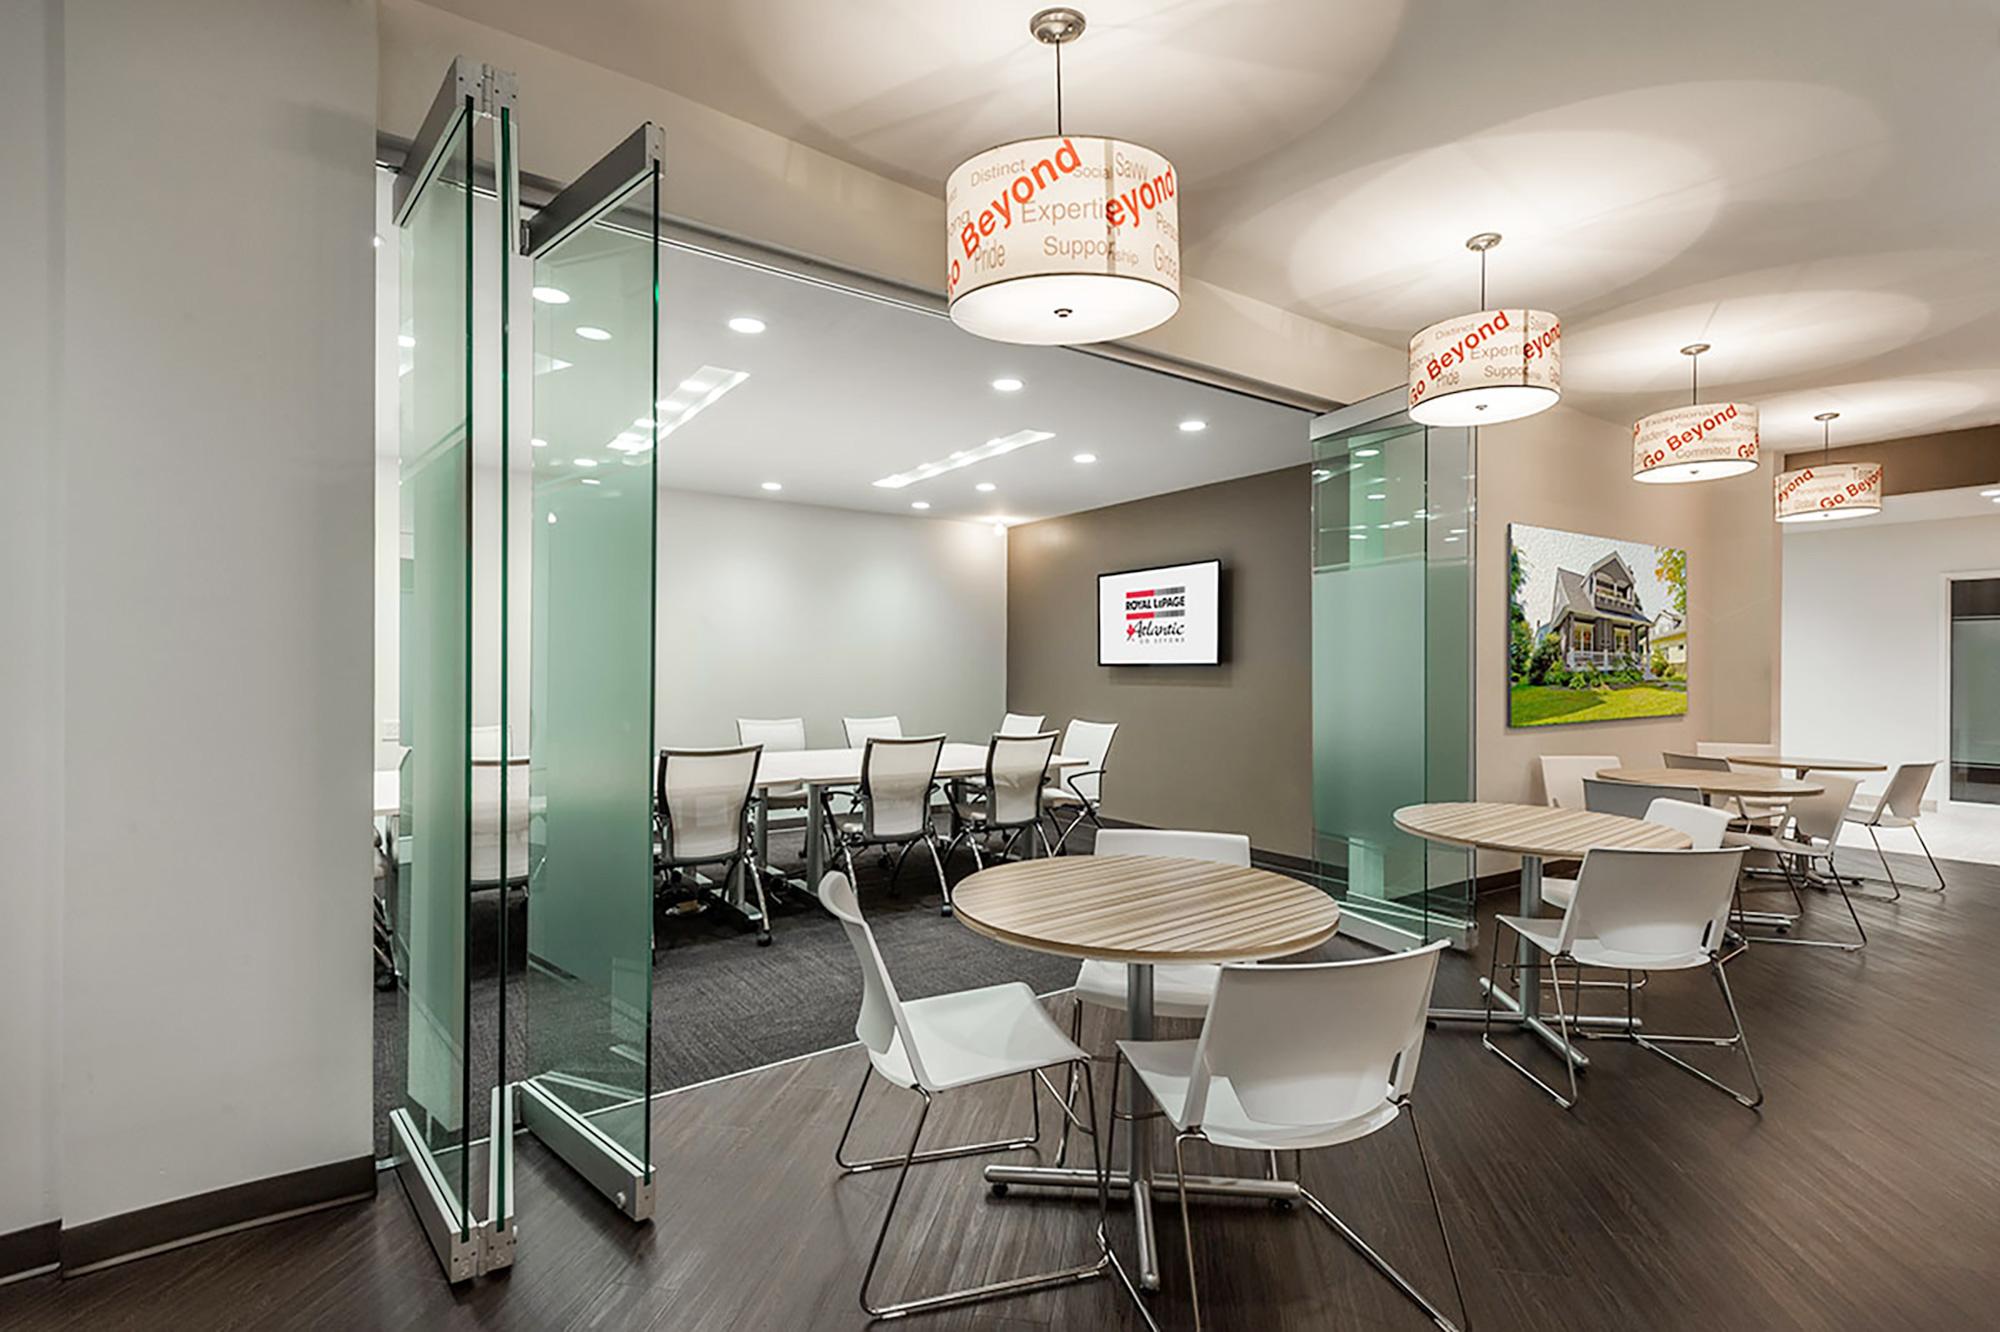 interior-design-real-estate-office-seating.jpg